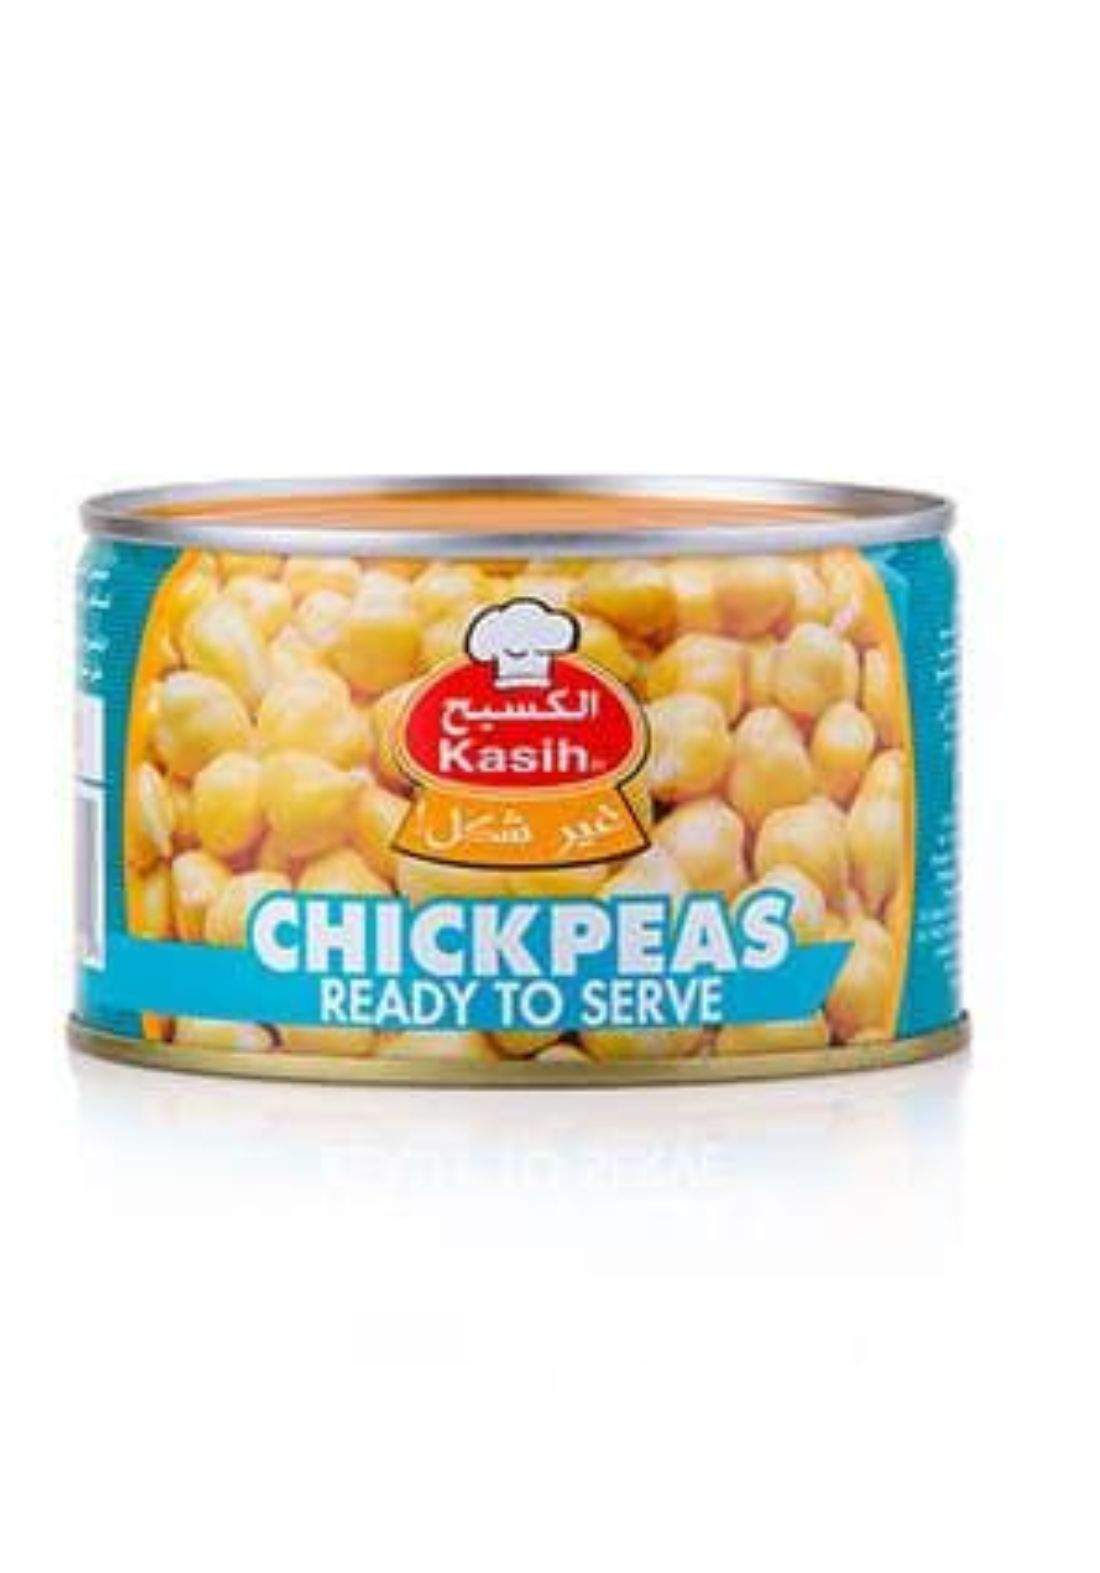 Kasih chickpeas 400g الكسيح حمص حب